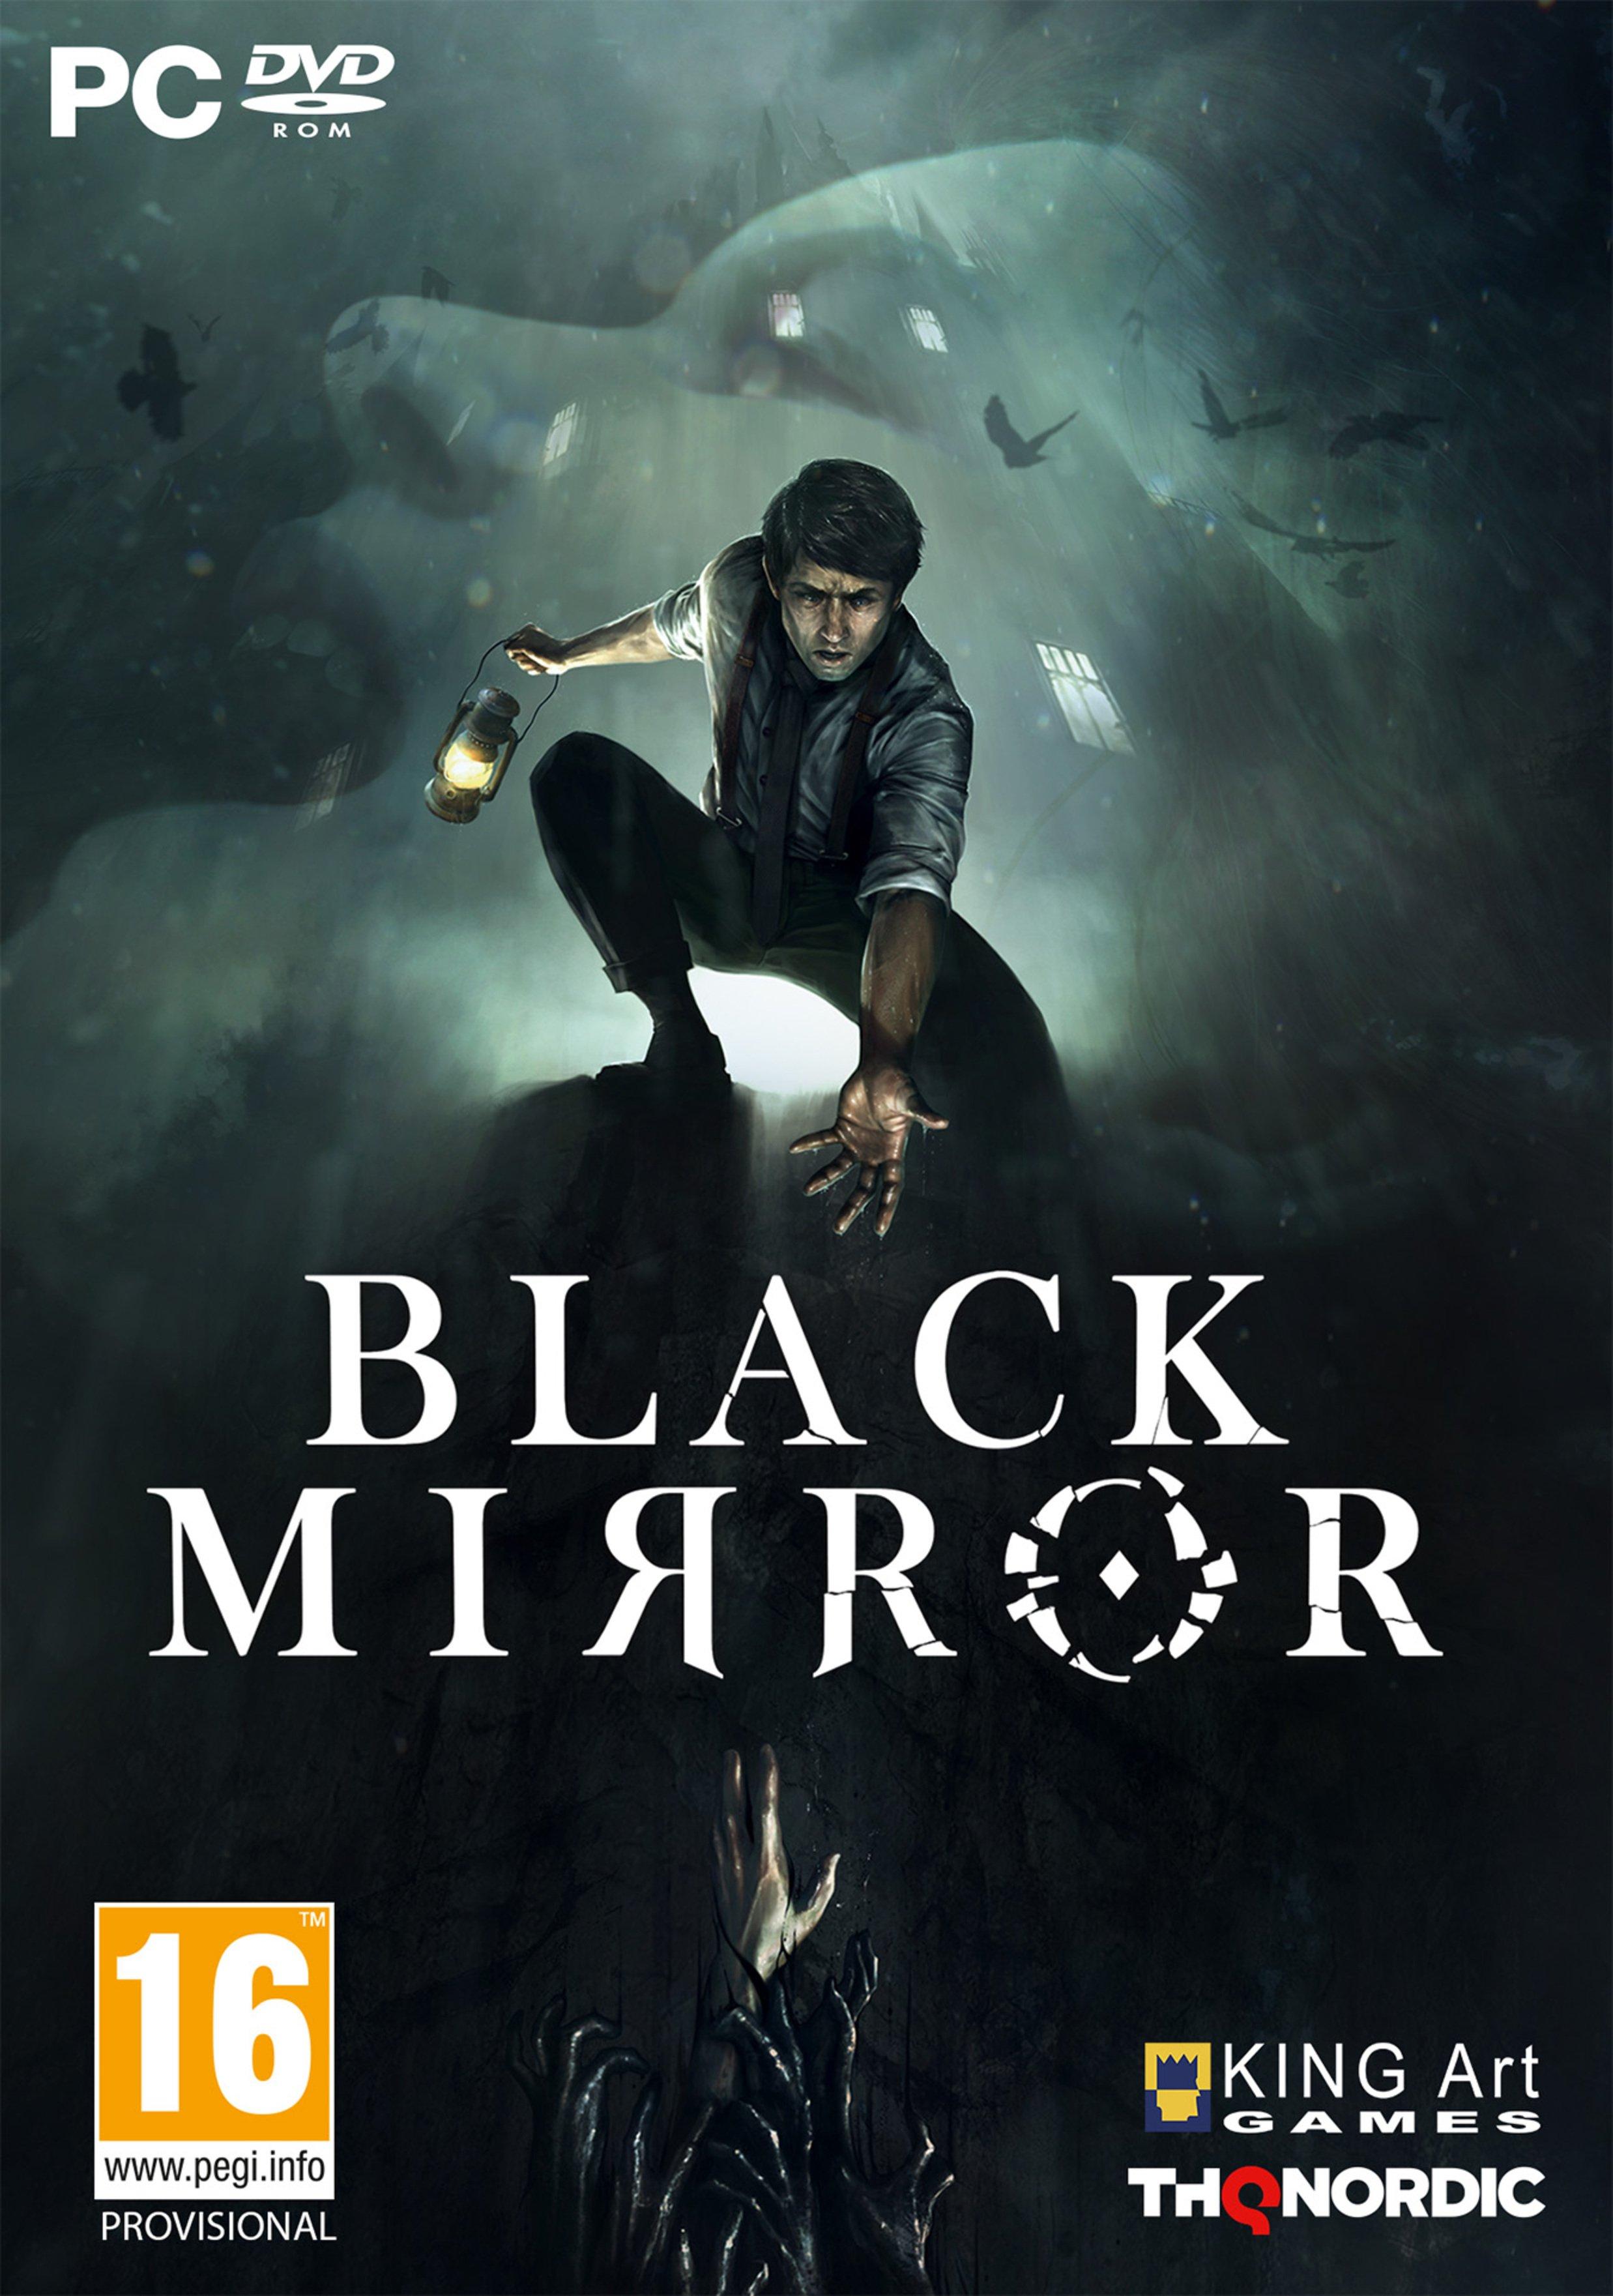 Image of Black Mirror PC Game